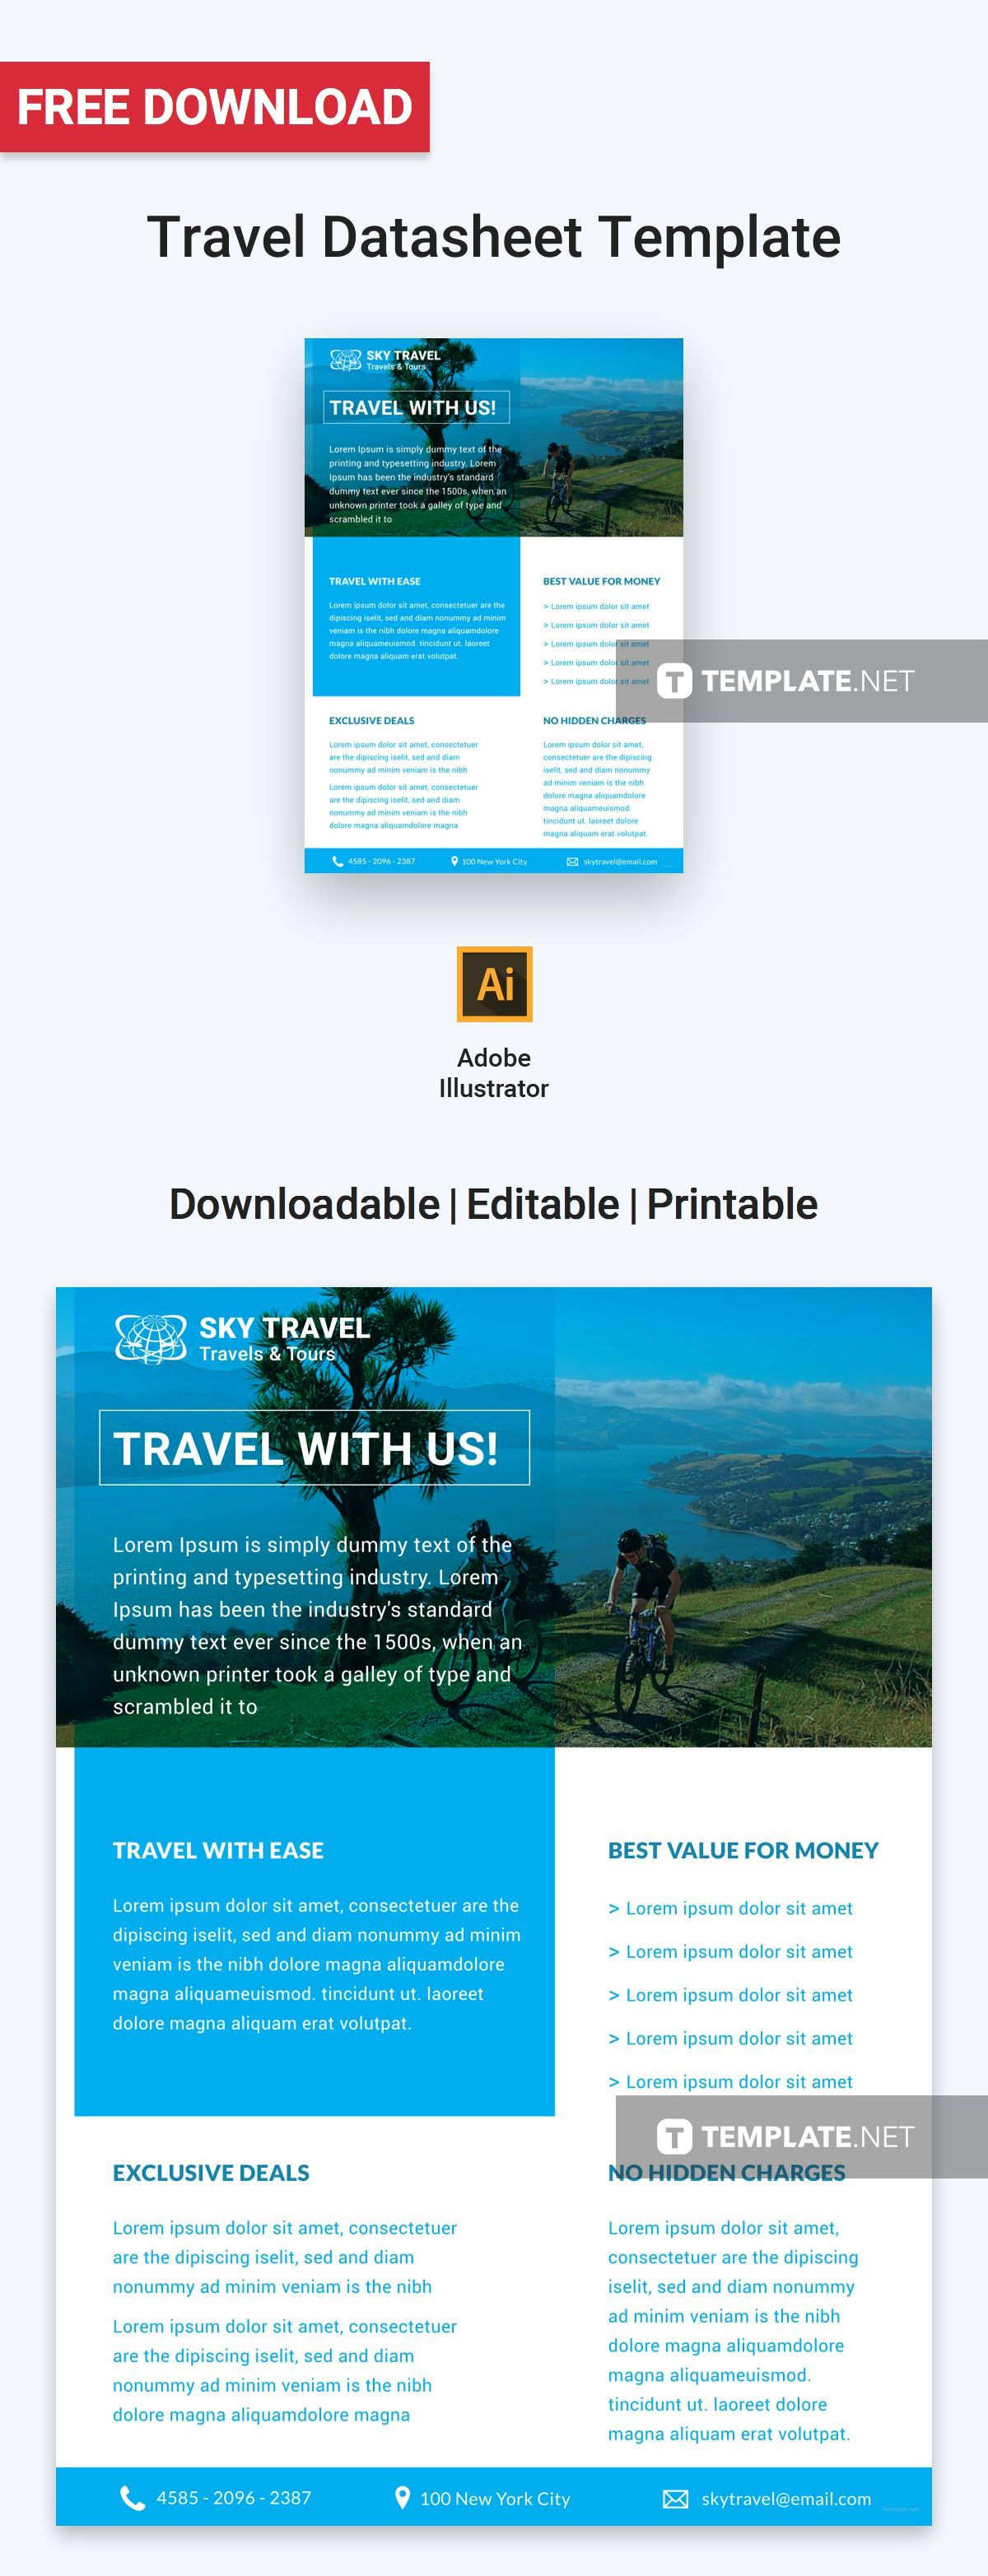 FREE Travel Datasheet Template - PDF | Word (DOC) | Apple ...